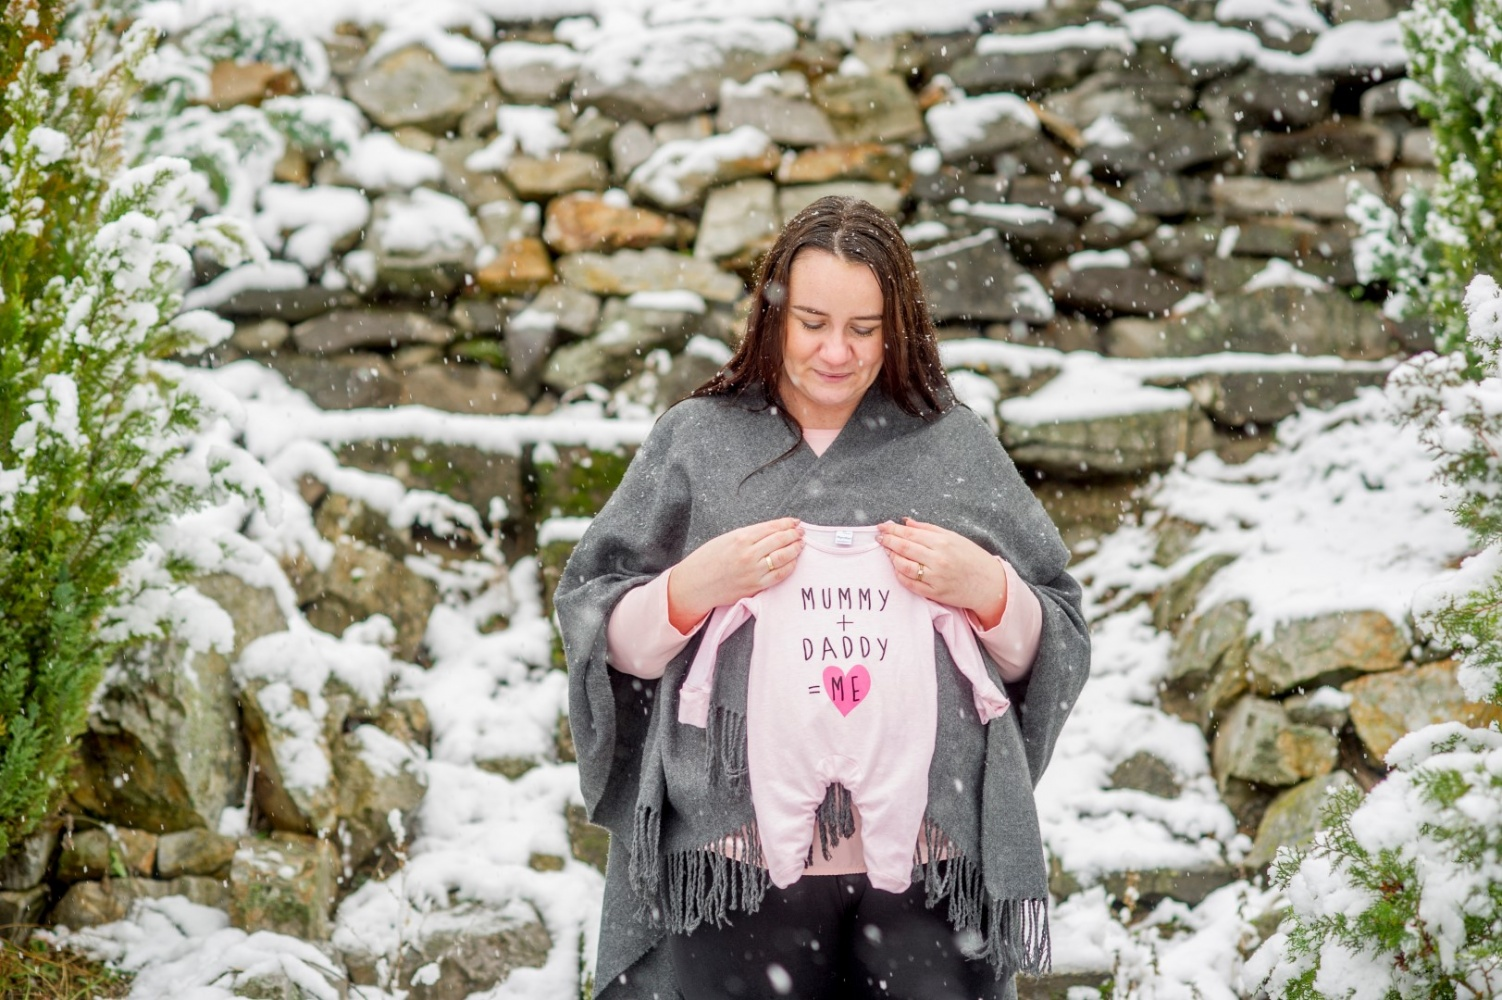 http://www.fotoz.sk/images/gallery-47/normal/teli-kismama-fotozas_kismama-fotok_winter-pregnacy-photo_fotenie-tehuliek_winter-maternity-foto_teli-kismama_tehulka_tehulka-foto_zimne-fotenie_kreativ-kismama-fotozas_059.jpg